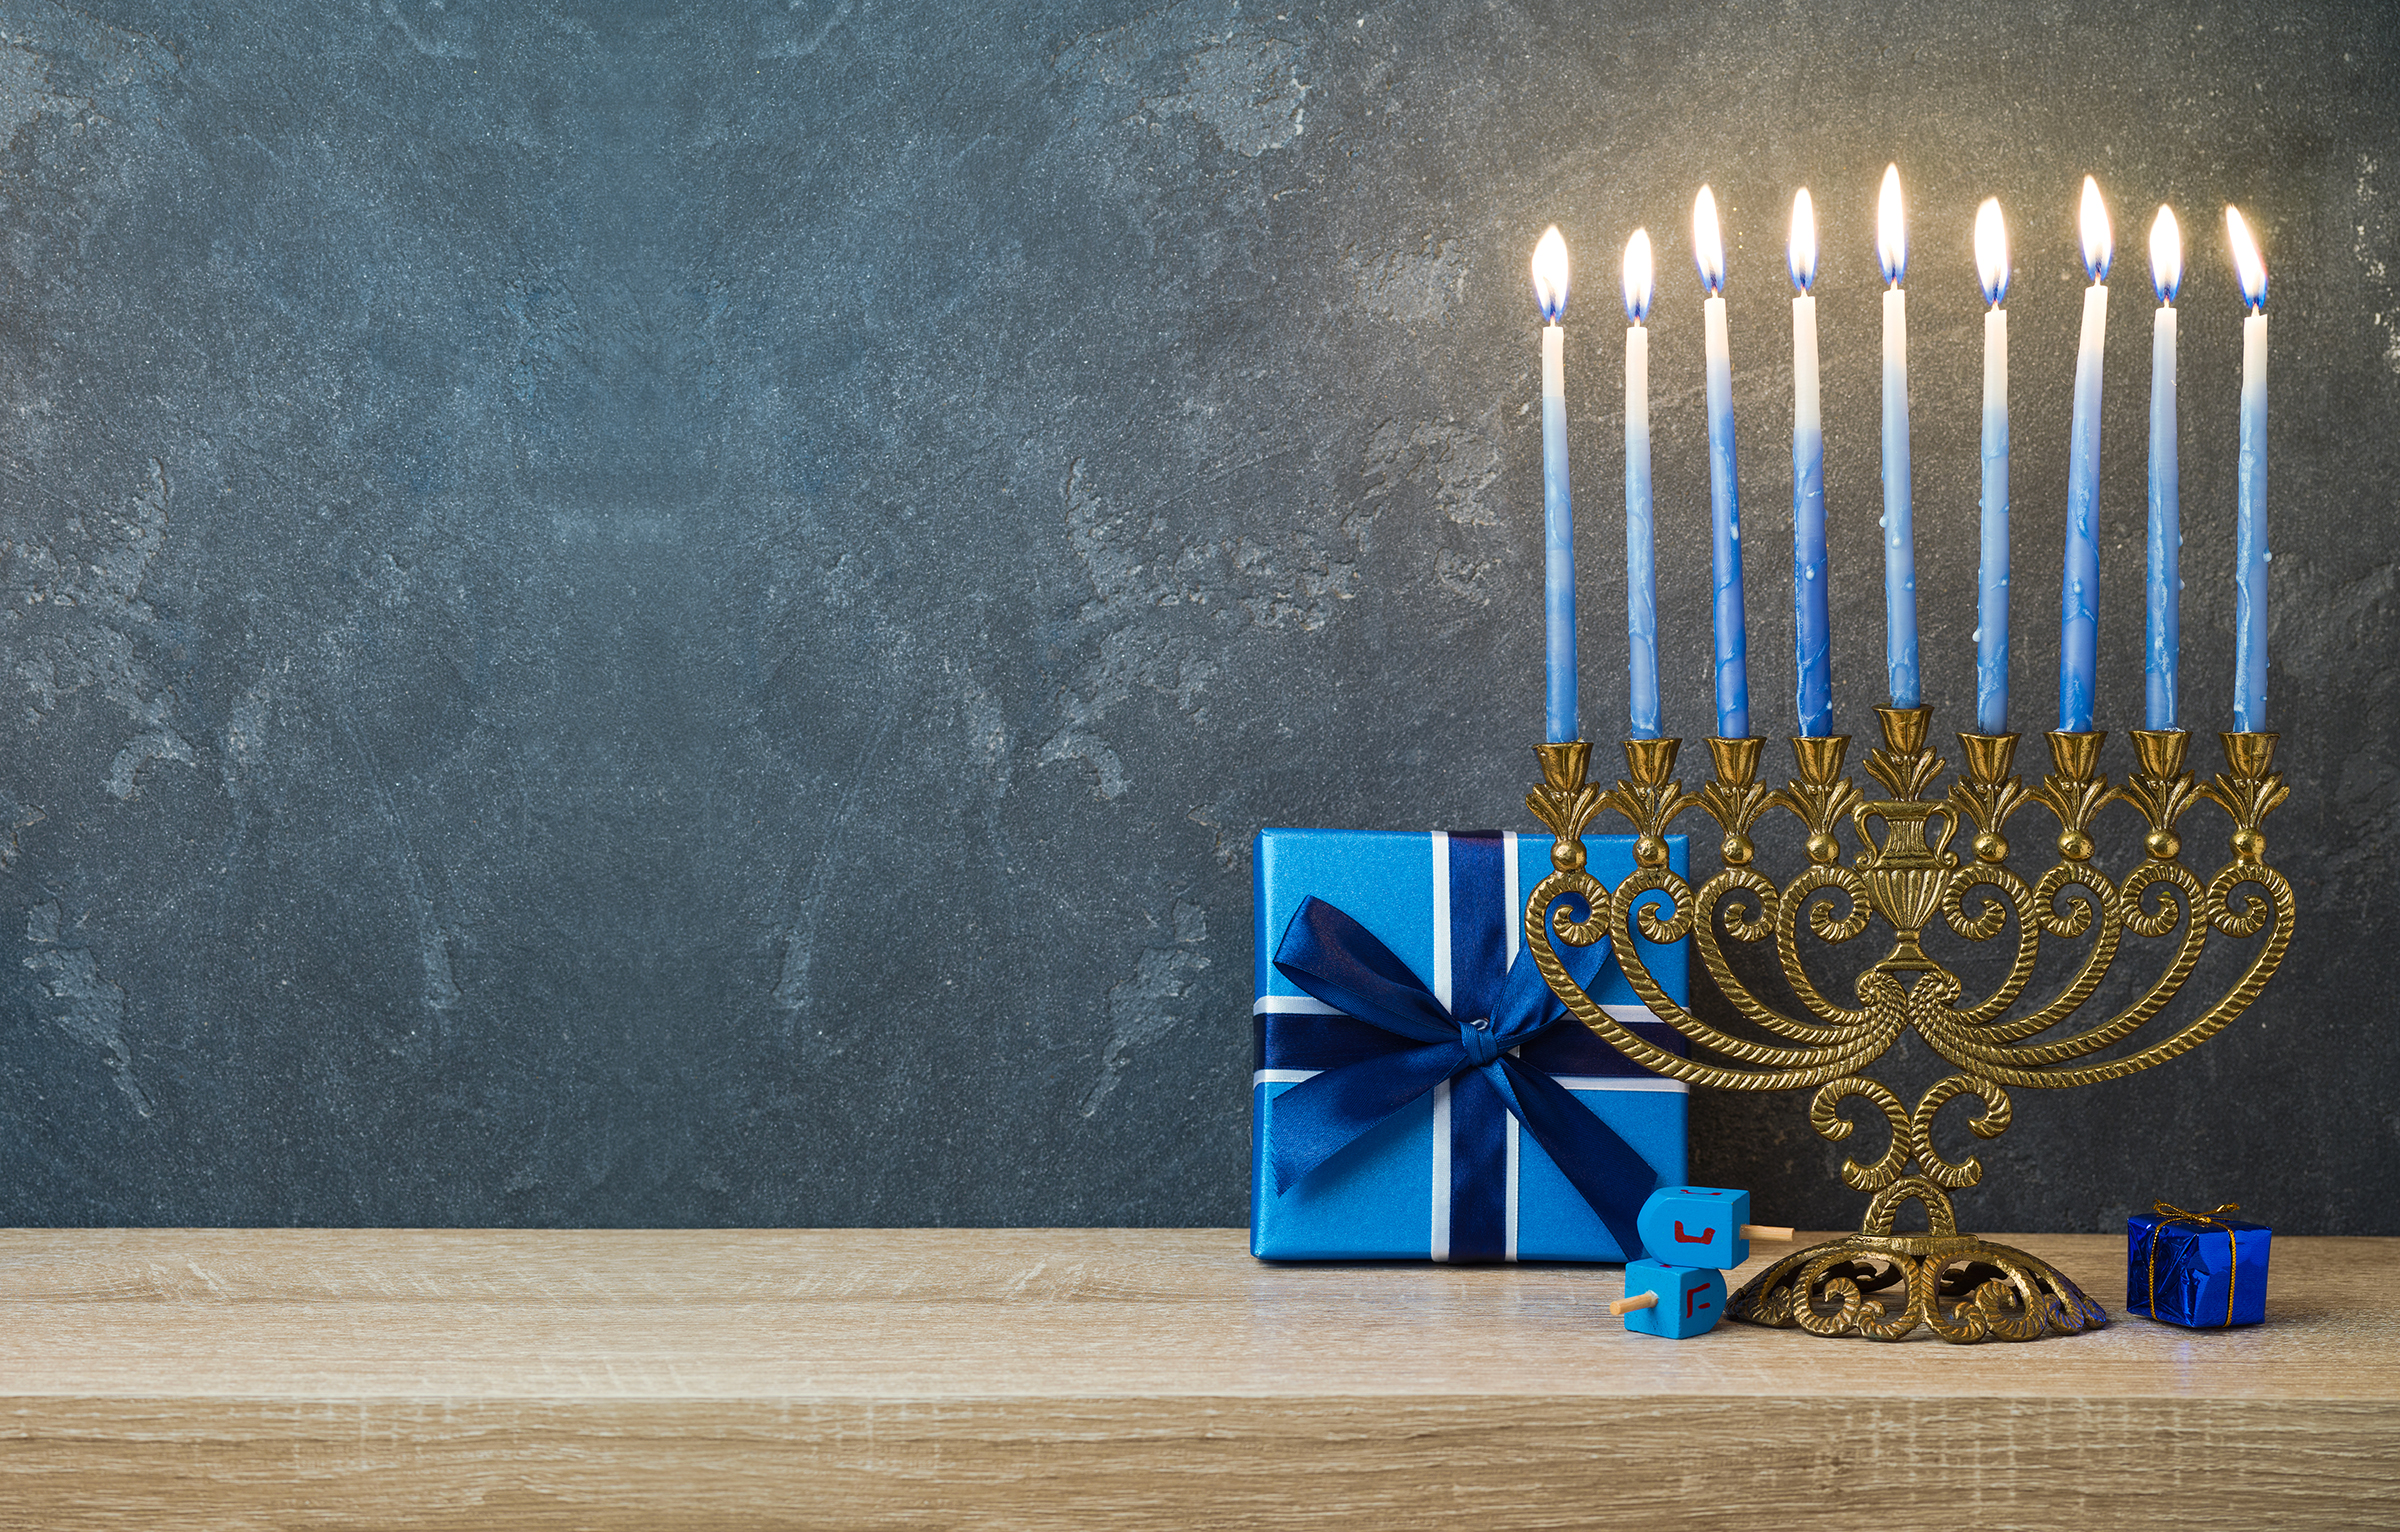 Hanukkah celebration with menorah, gift box and dreidel on wooden table over blackboard background